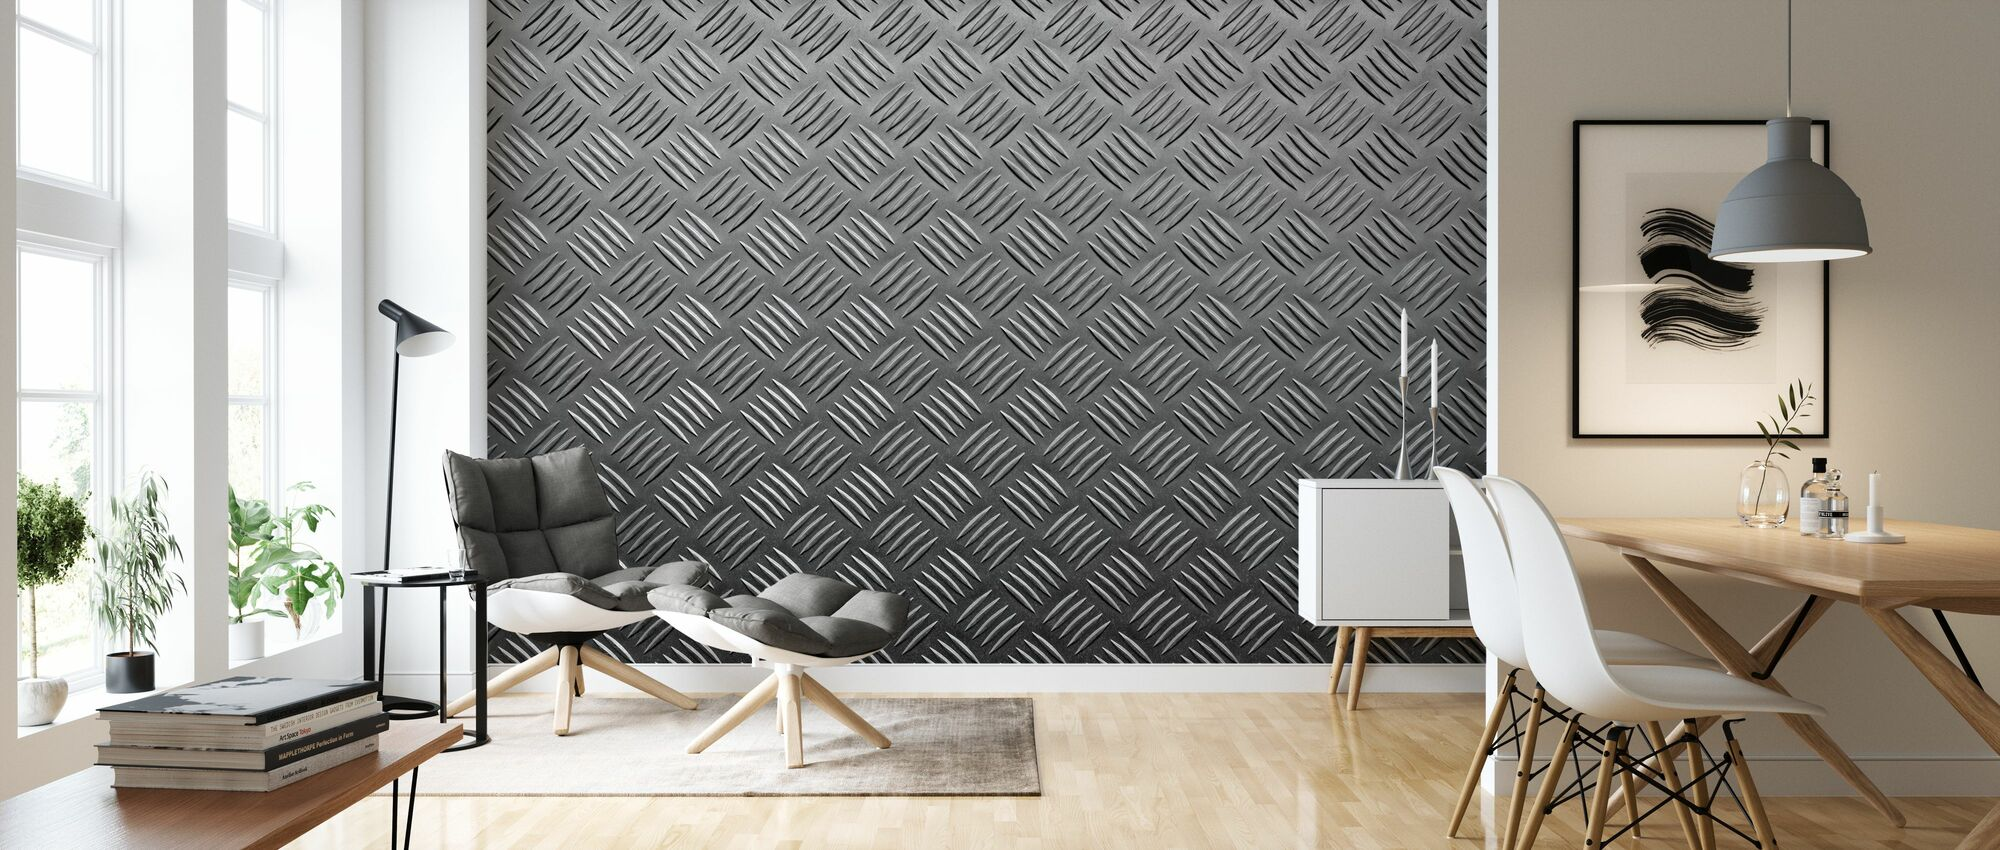 Metal Pattern - Wallpaper - Living Room